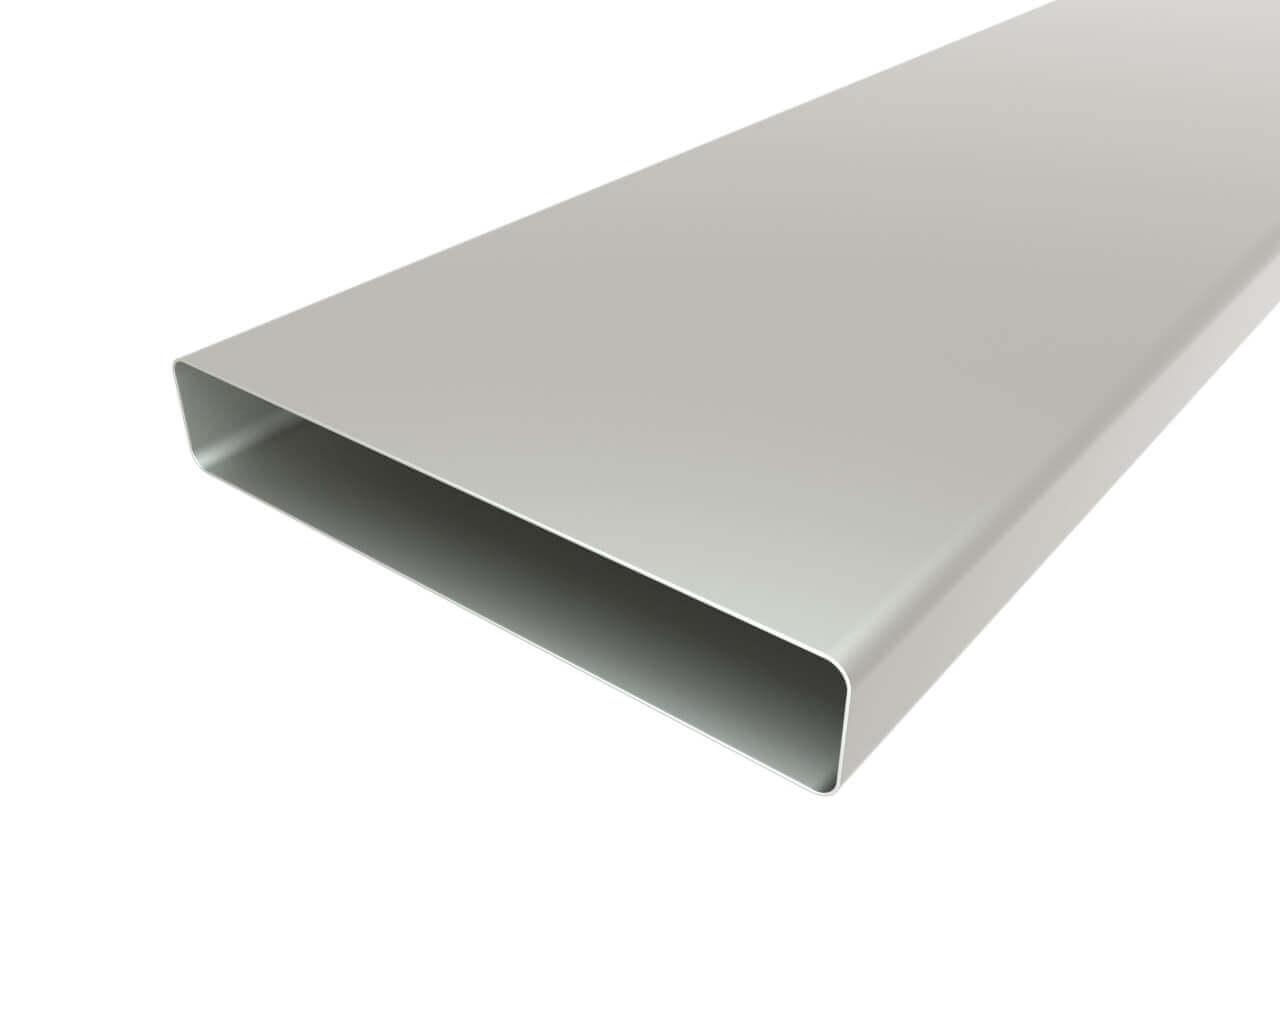 Алюминиевая пластина для ленты LC-AP-0212-2 anod